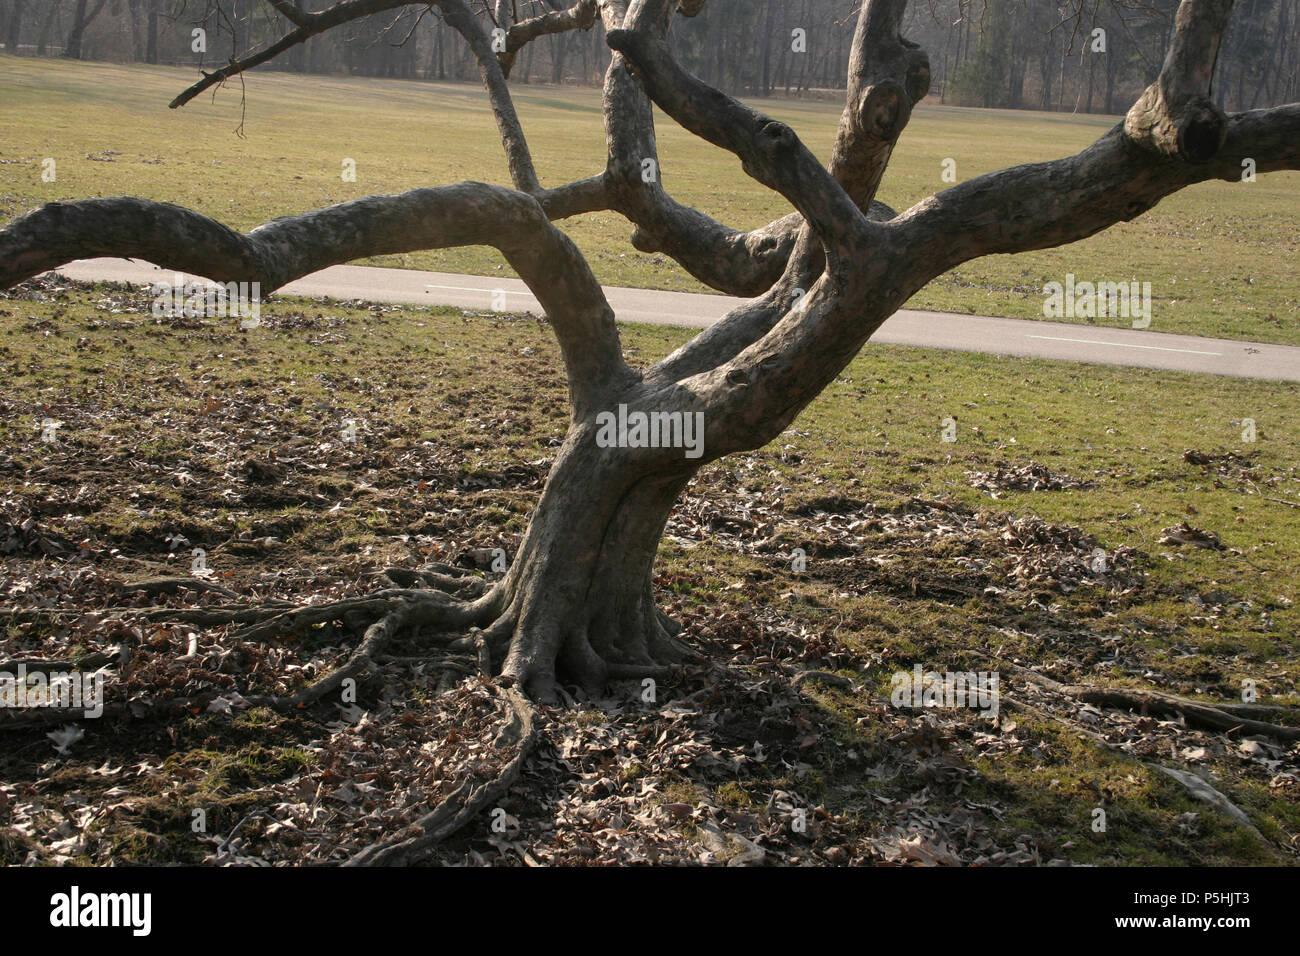 Small ornamental tree in public space - Stock Image